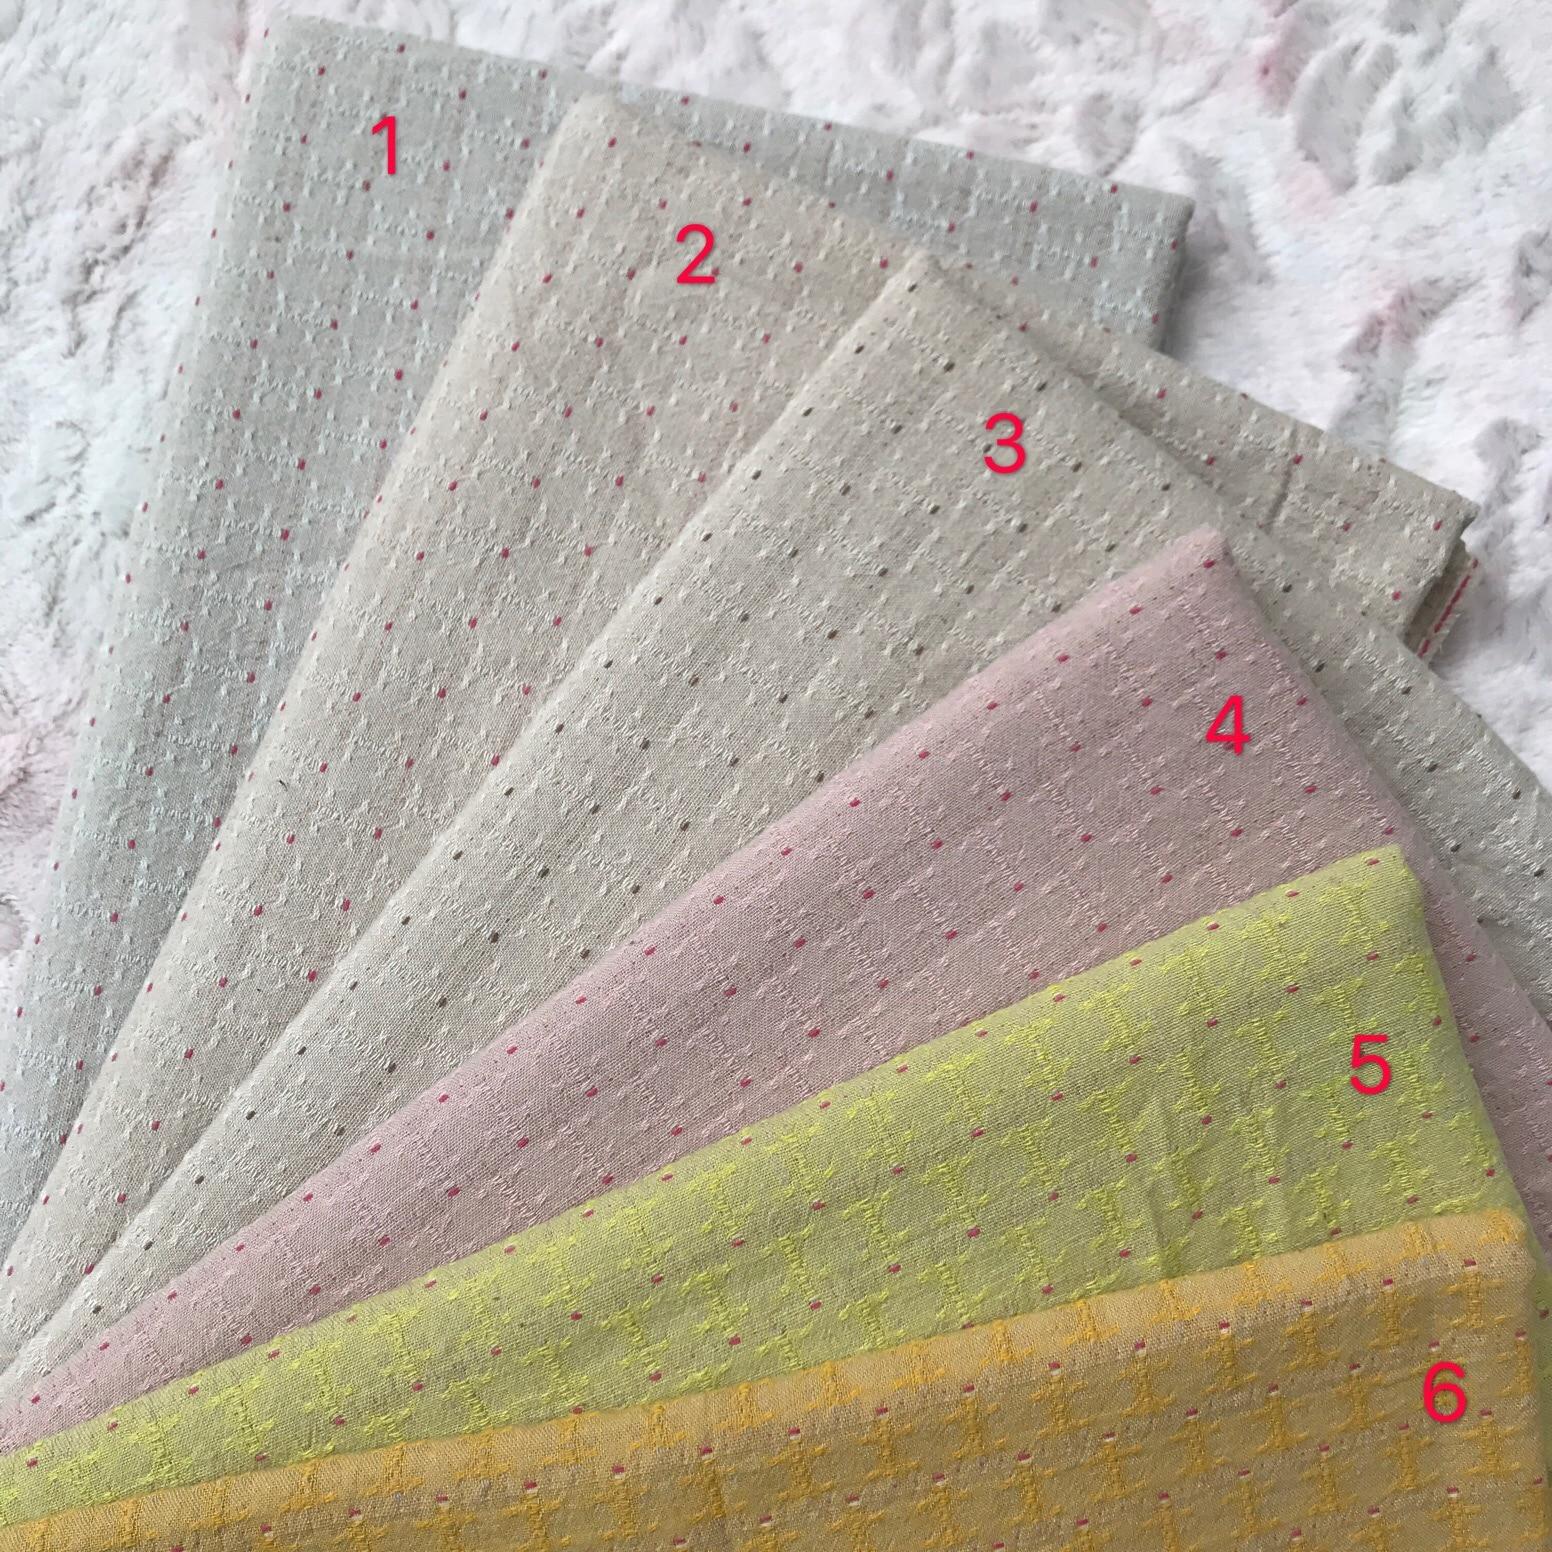 50x75cm DIY Japón tela pequeño grupo de tela hilado-teñido tela para columpio hecho a mano Patchwork acolchado rejilla raya punto